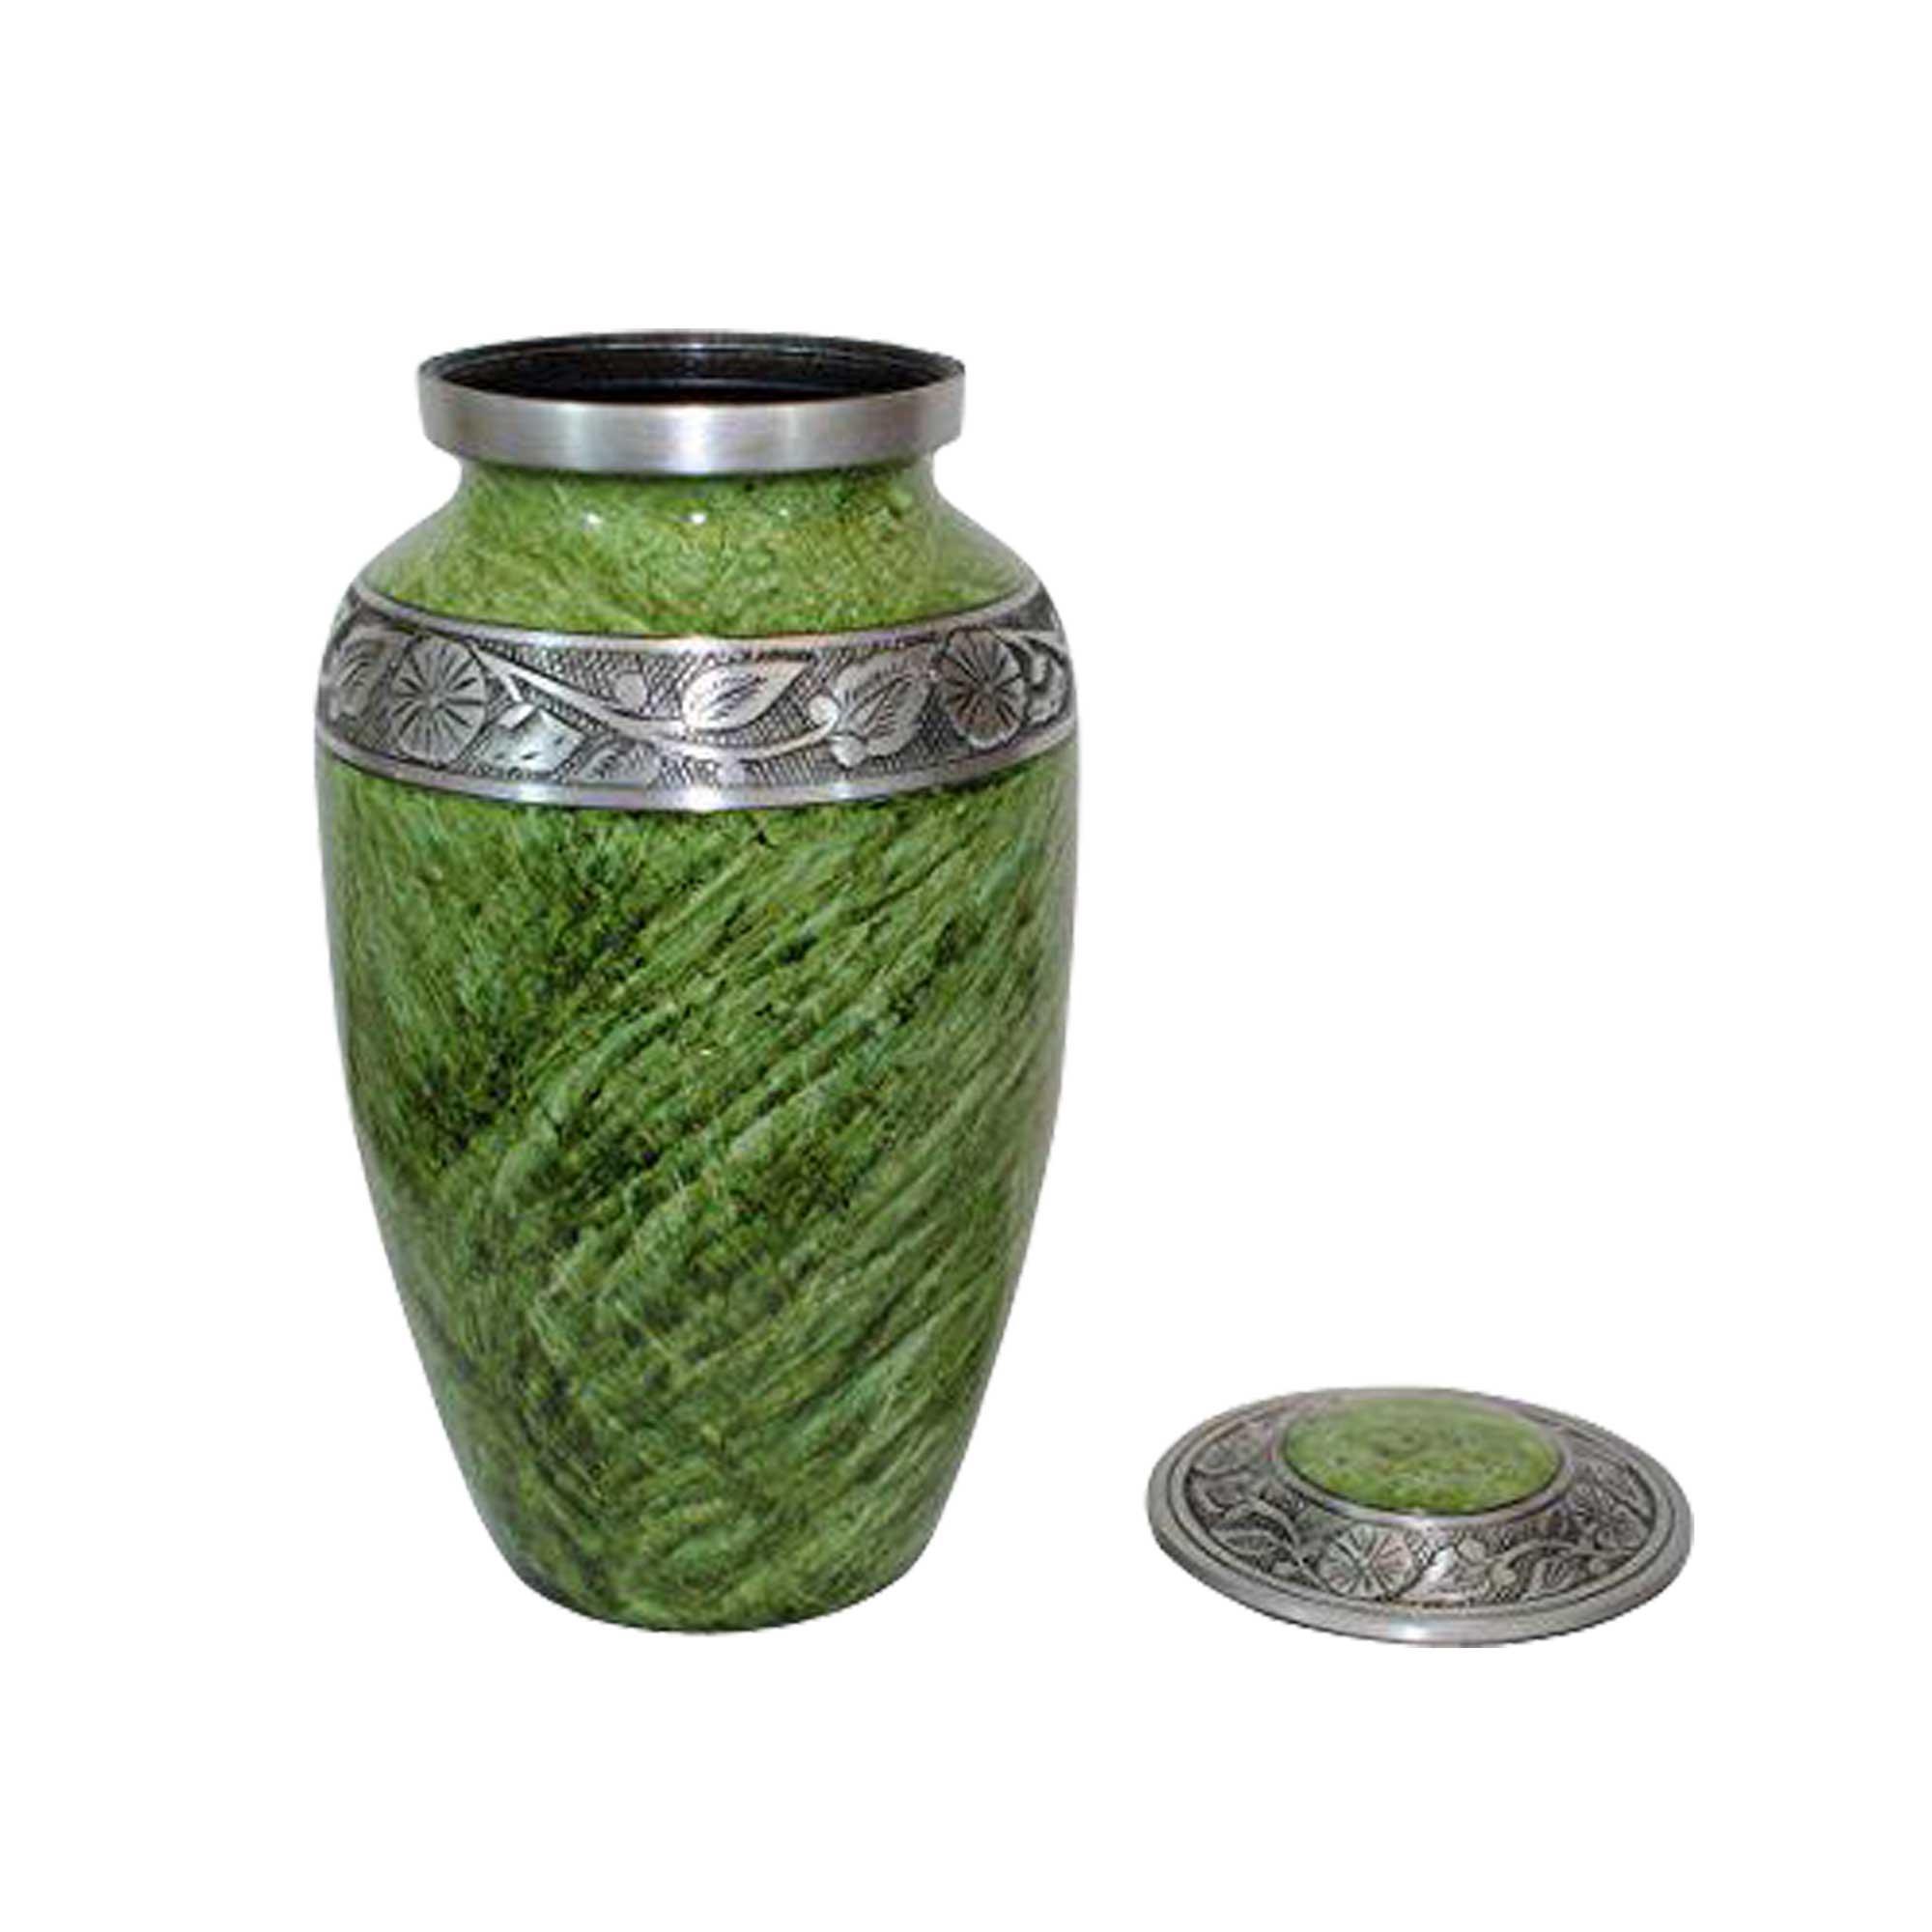 decorative casket, metal urn